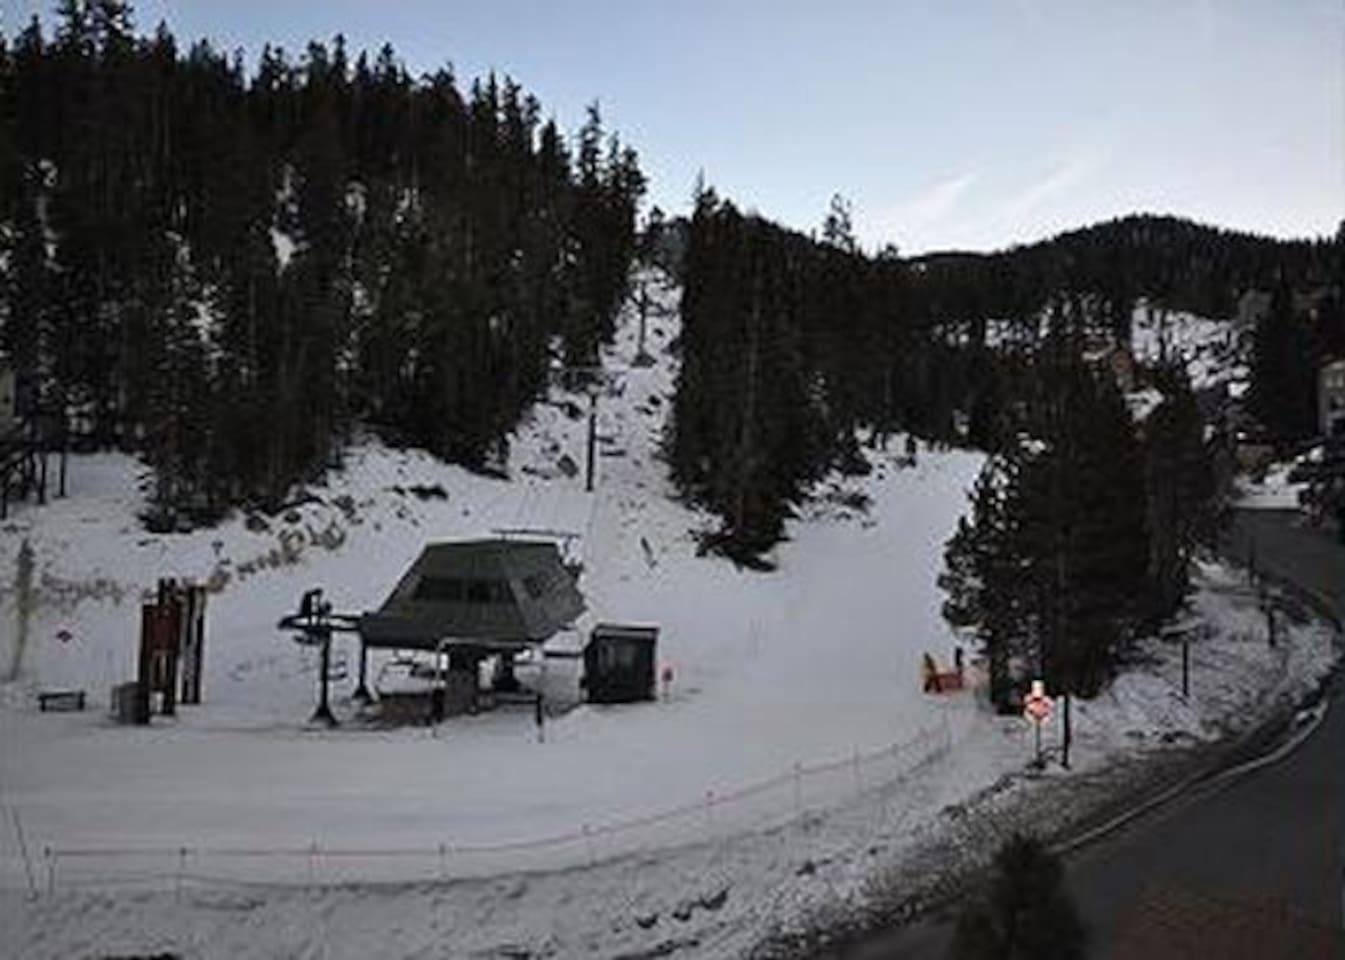 SKI in SKI out Stagecoach Ski Lift